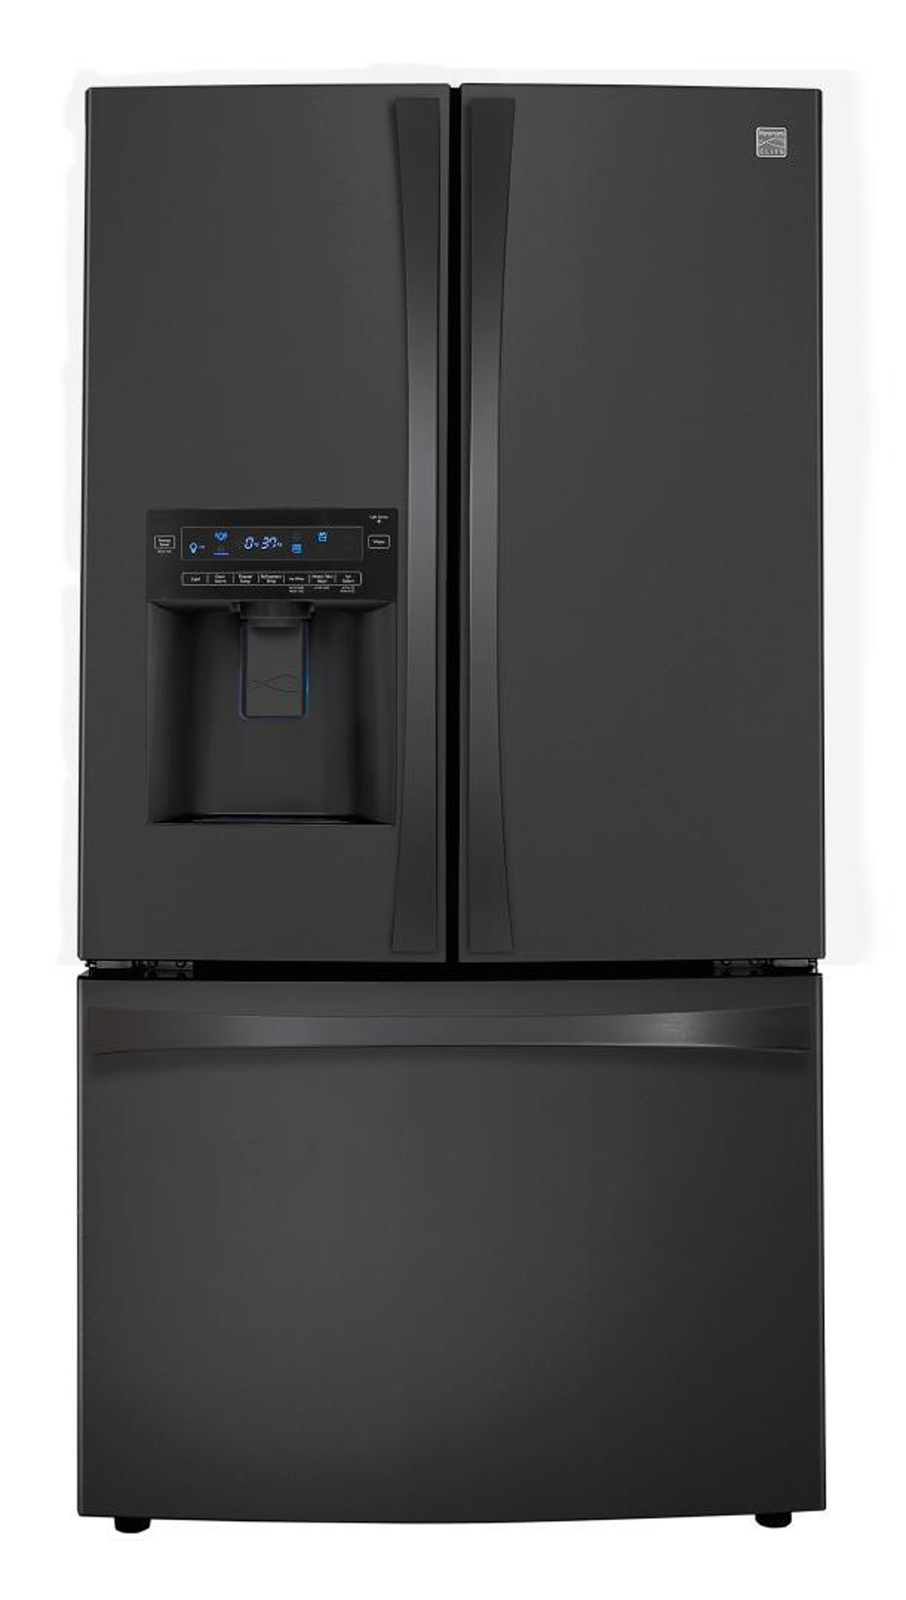 Kenmore Elite 31 cu. ft. Grab-N-Go French Door  Bottom-Freezer Refrigerator - Black